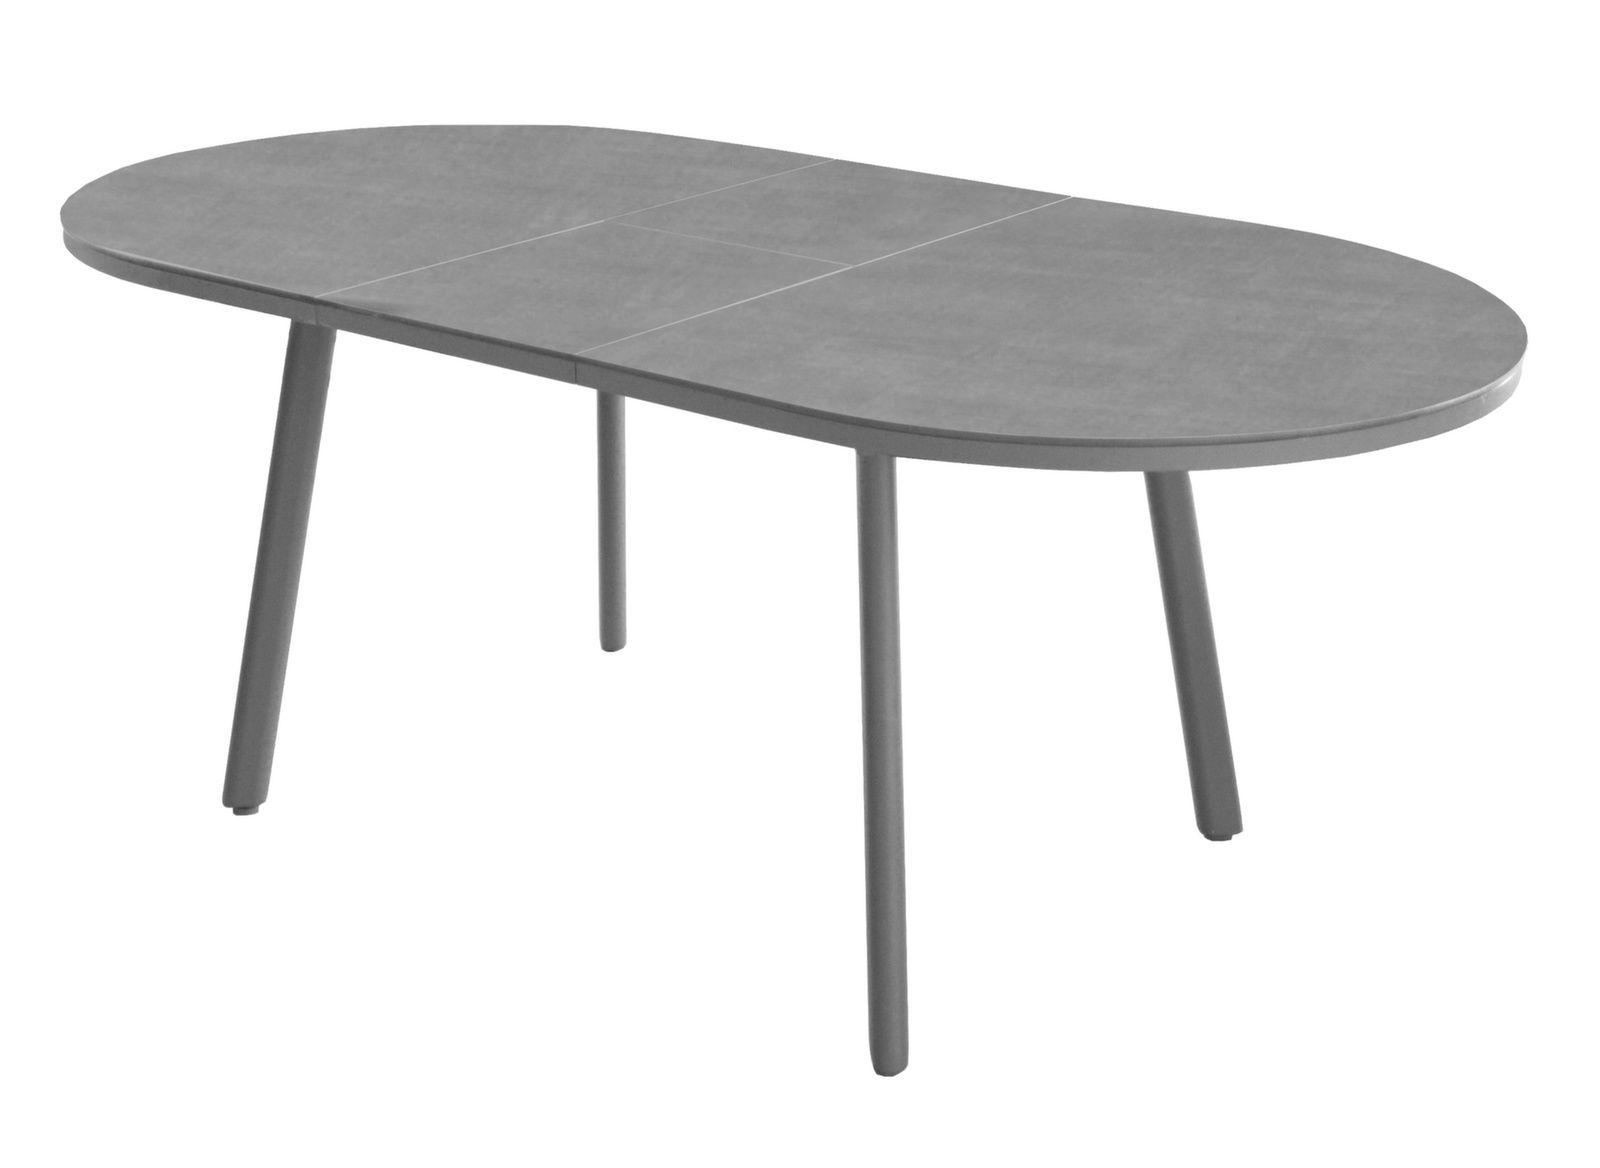 Table de jardin aluminium Bilbao 160/200 cm - Gamme Océo - Proloisirs